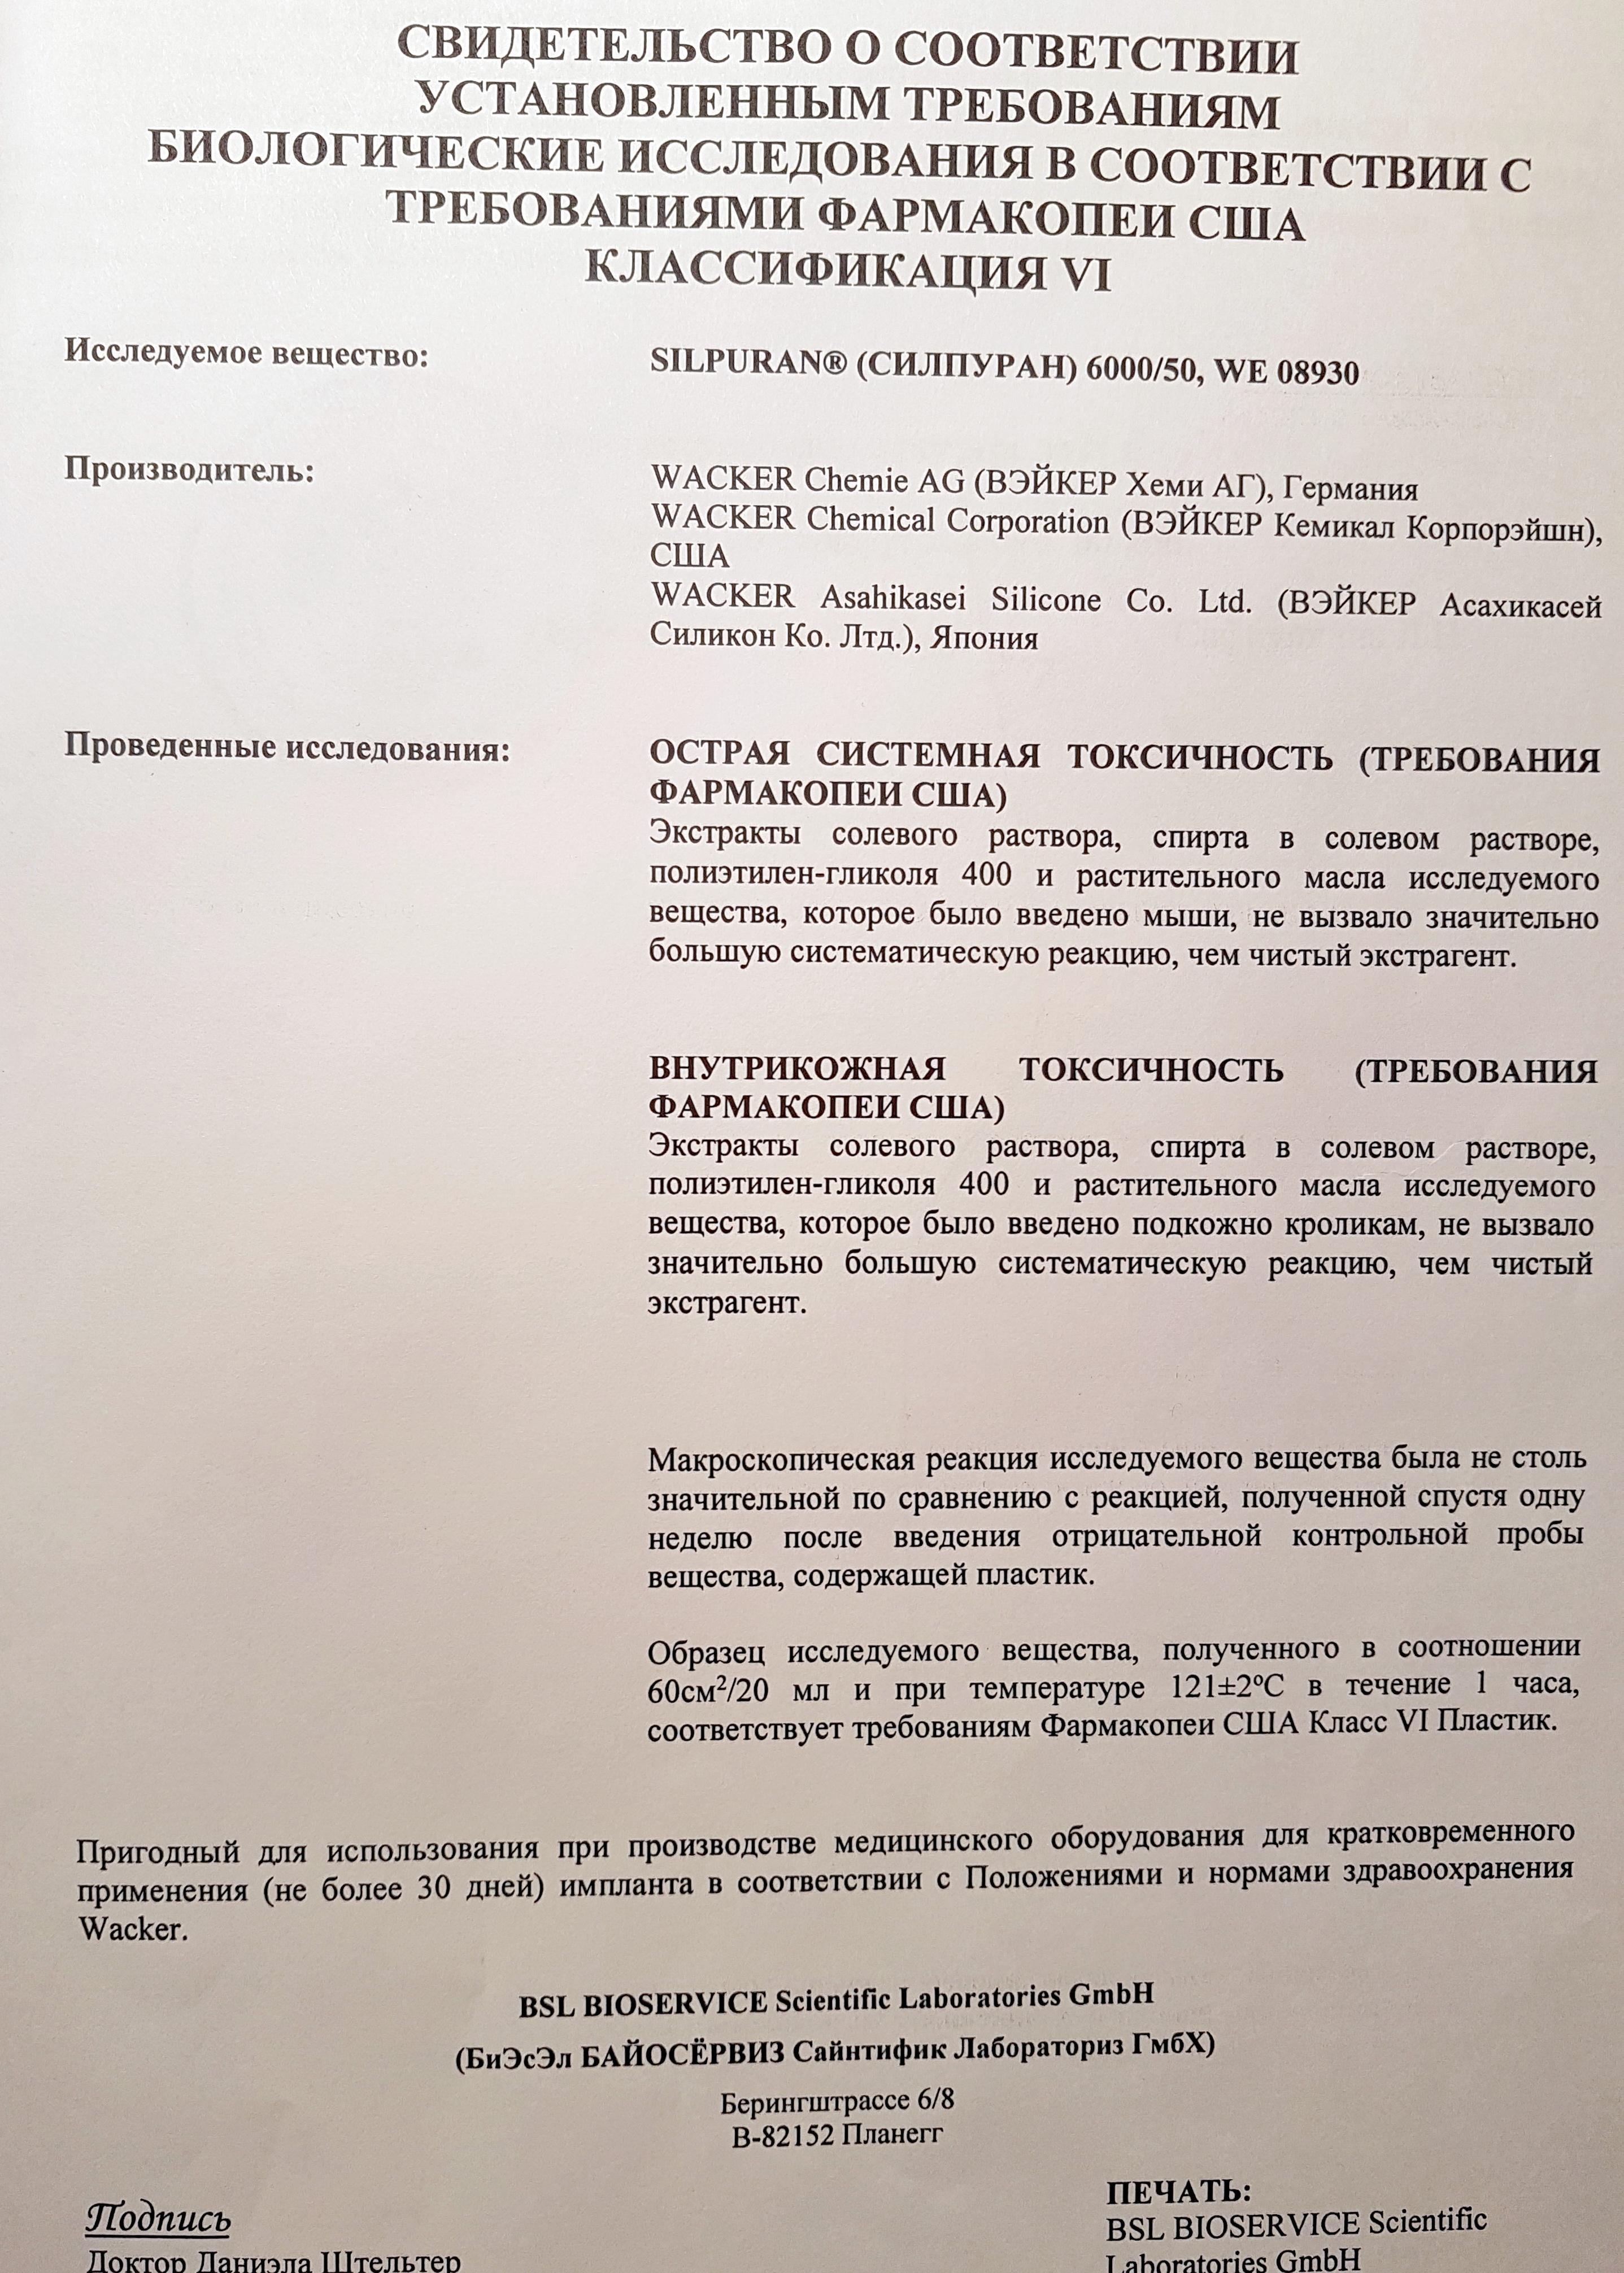 русский_перевод.jpg